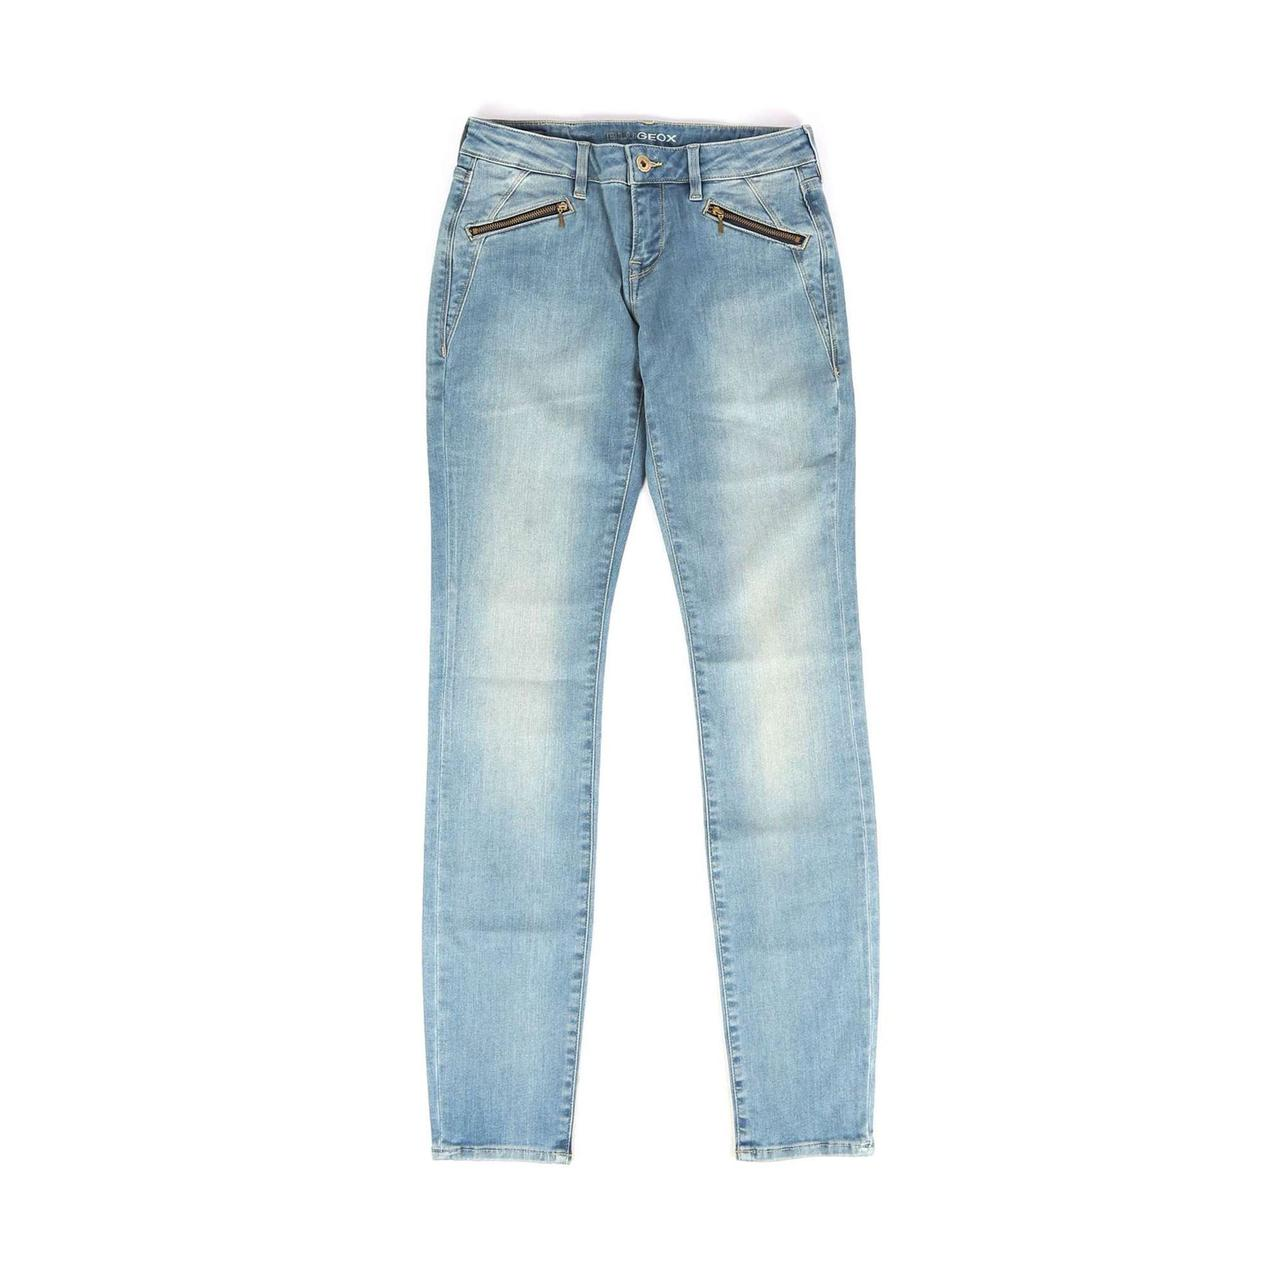 Женские джинсы Geox W5230A LIGHT BLUE